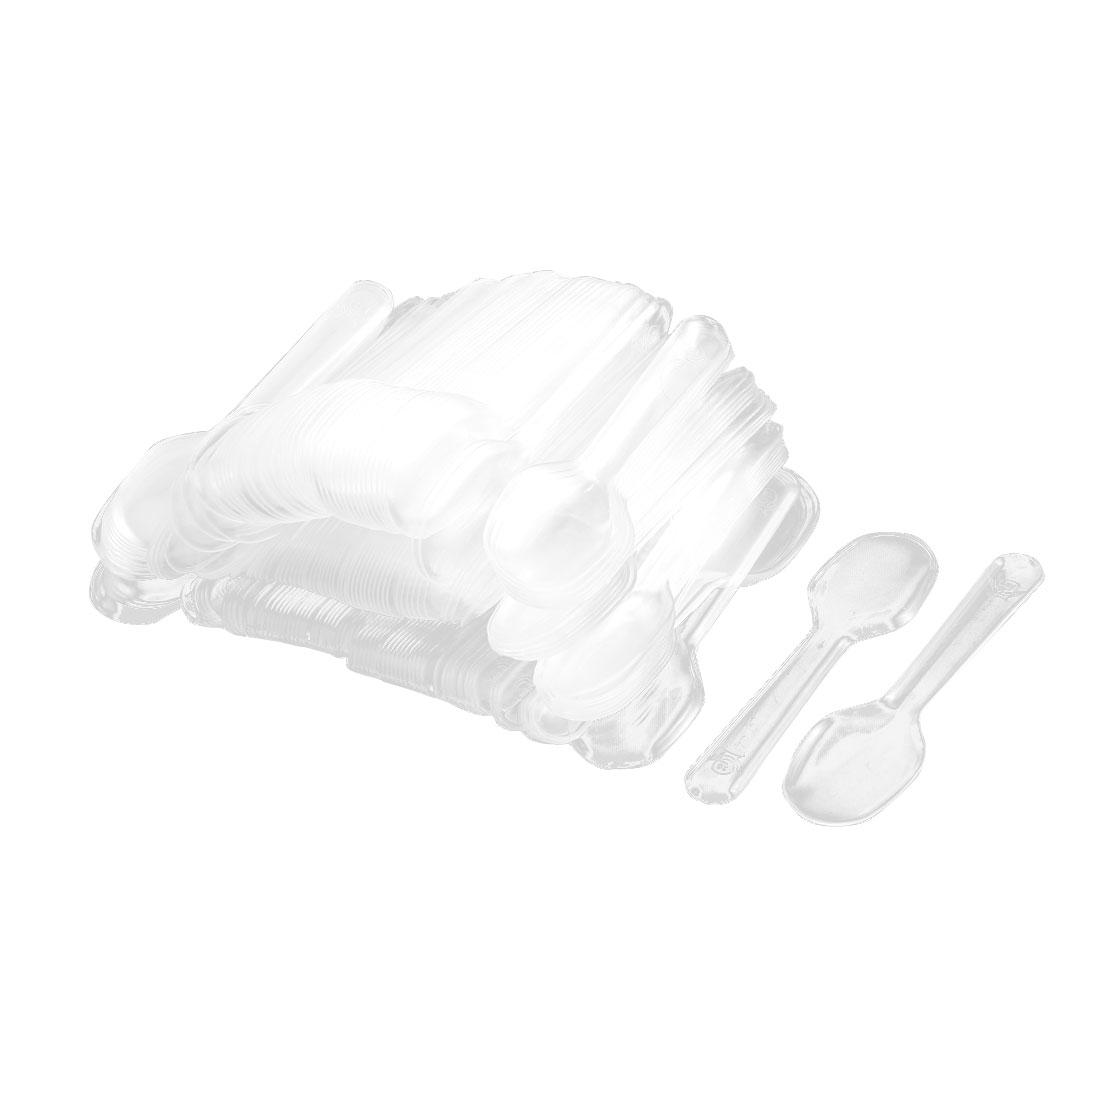 200 Pcs/lot Wedding Birthday Party Plastic Ice cream Frozen Yogurt Disposable Spoons(China (Mainland))